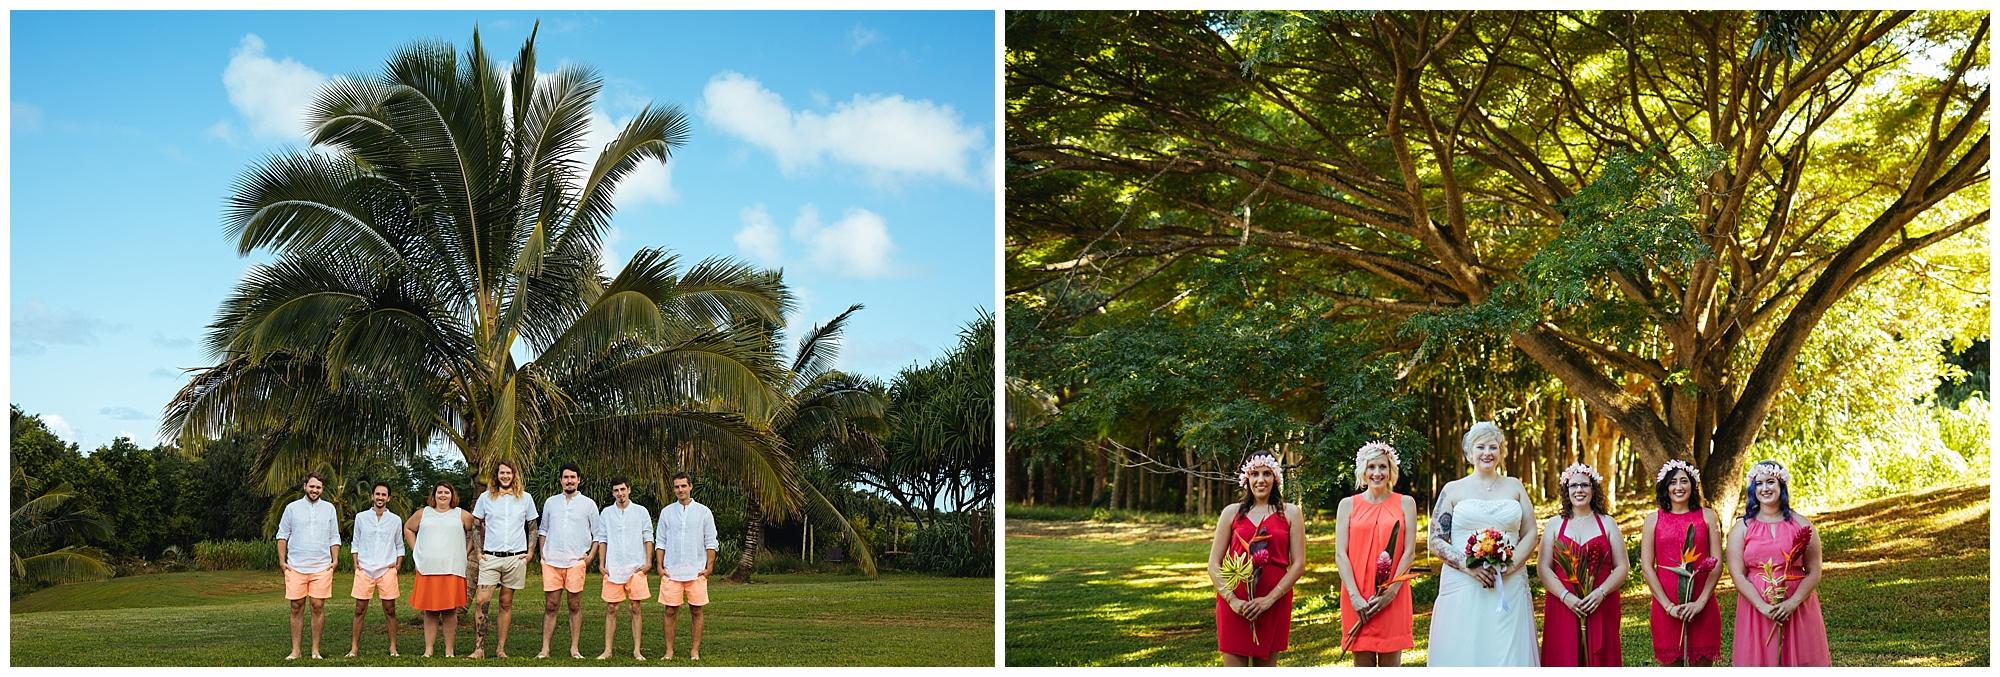 Kauai-Wedding_0036.jpg